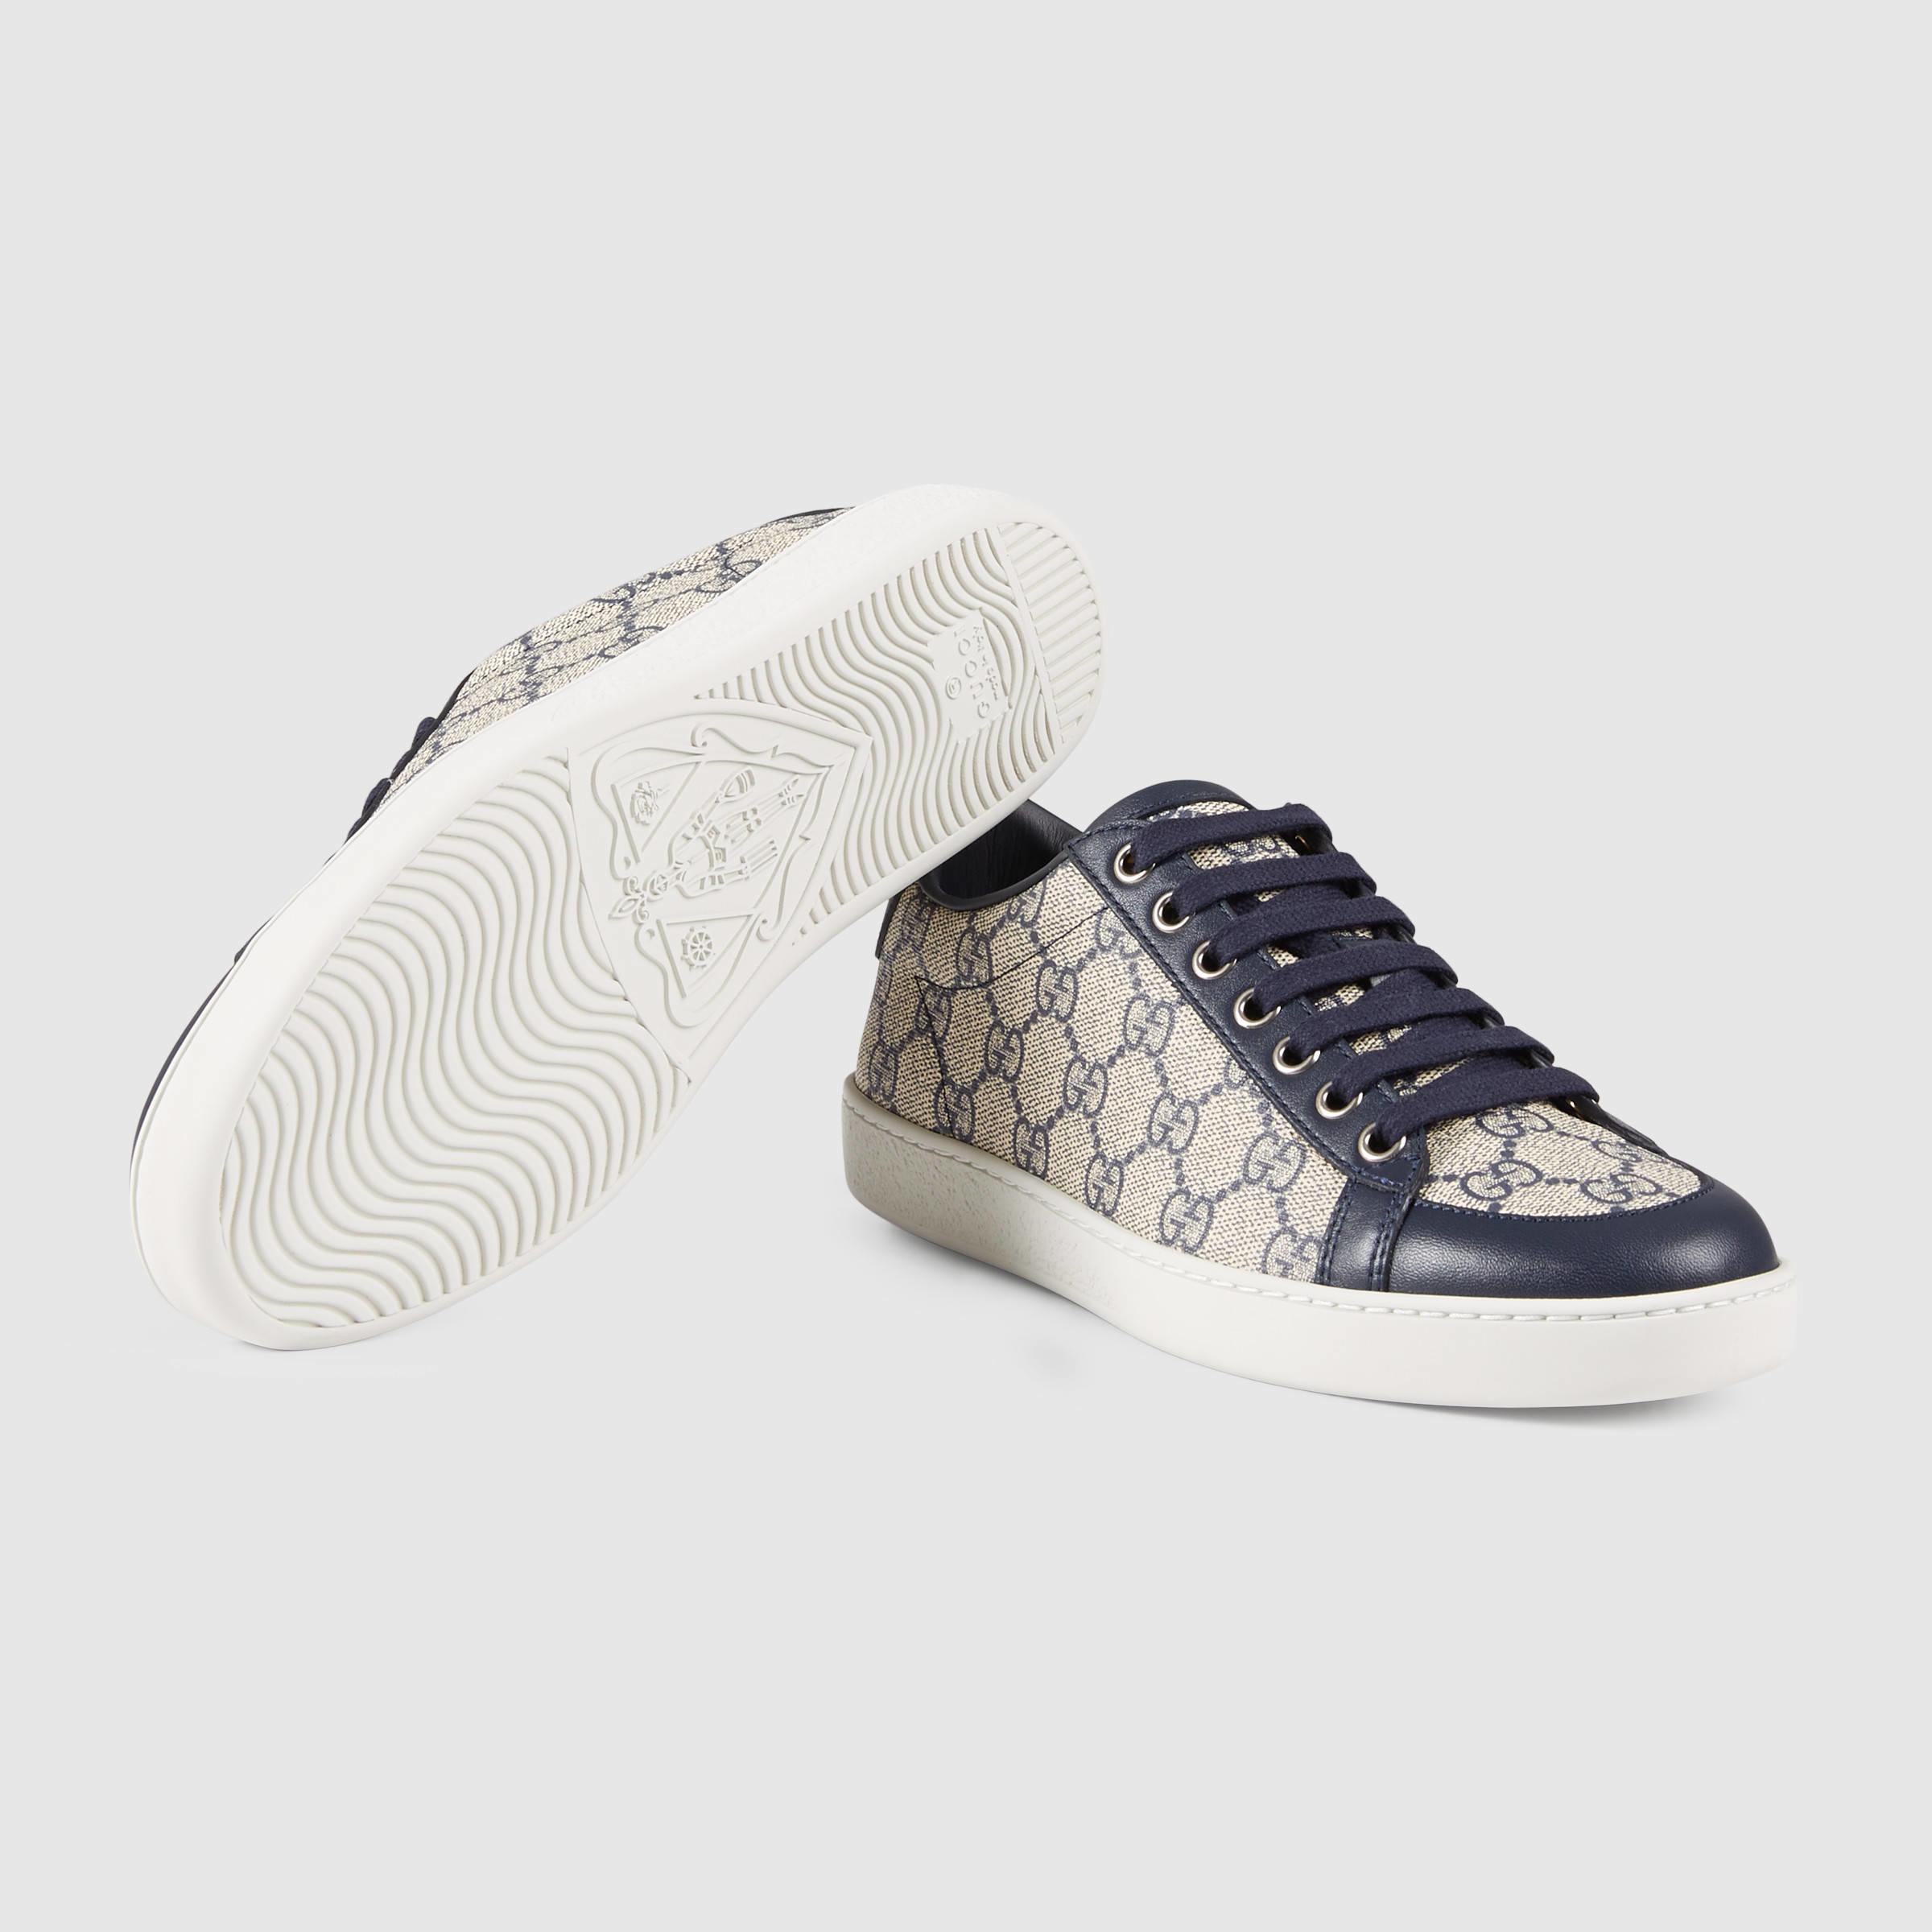 d17ccb1823b Lyst - Gucci Brooklyn GG Supreme Sneaker in Blue